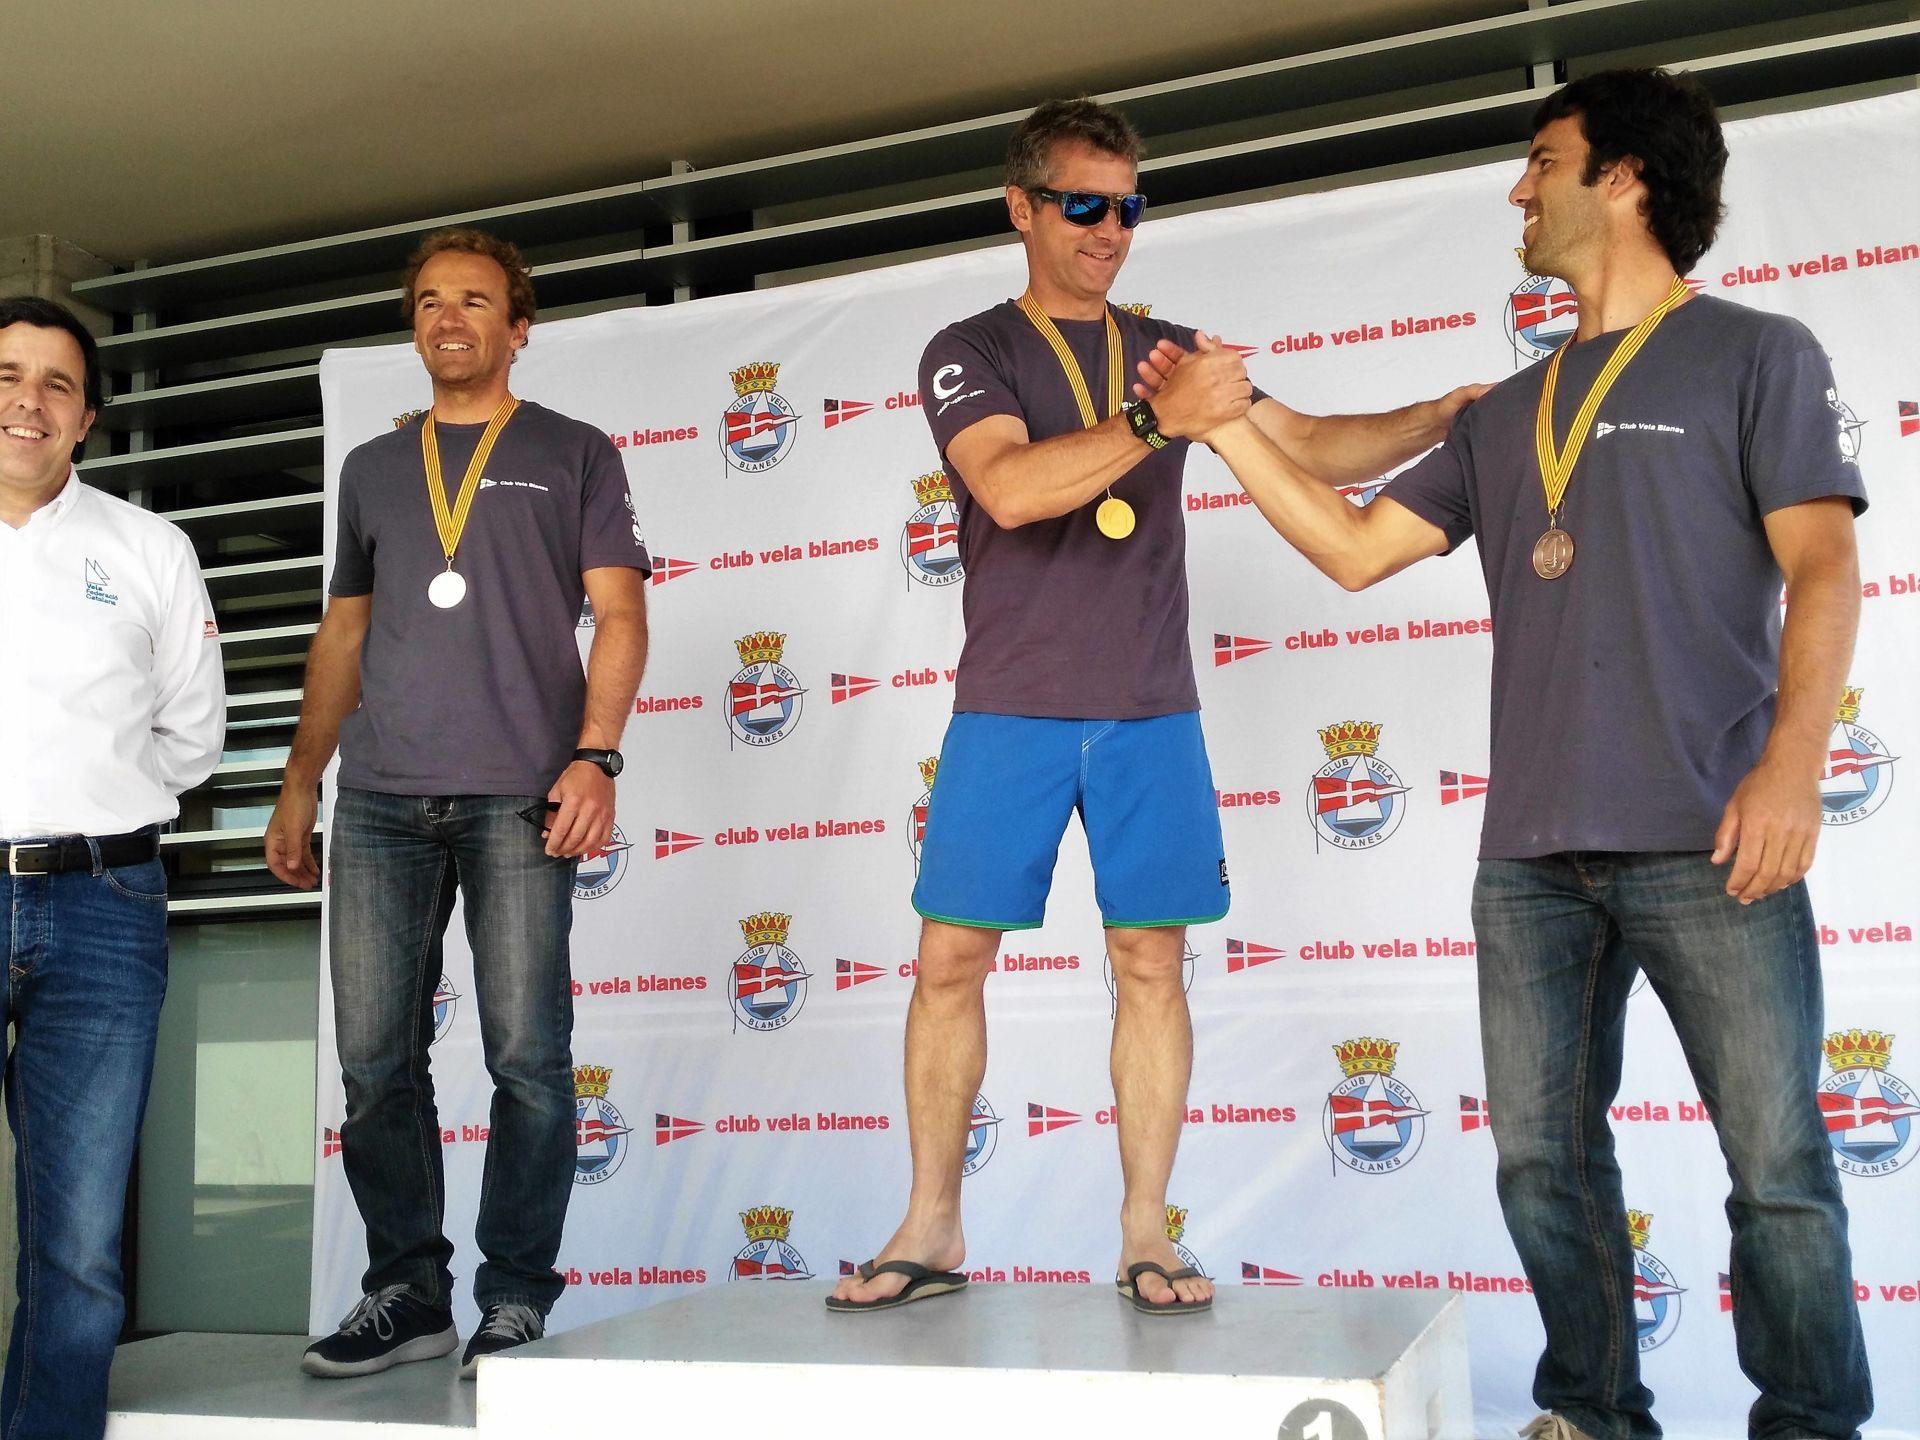 Gonzalo Giribet, del Club Vela Blanes, nou Campió de Catalunya 2017 de Raceboard